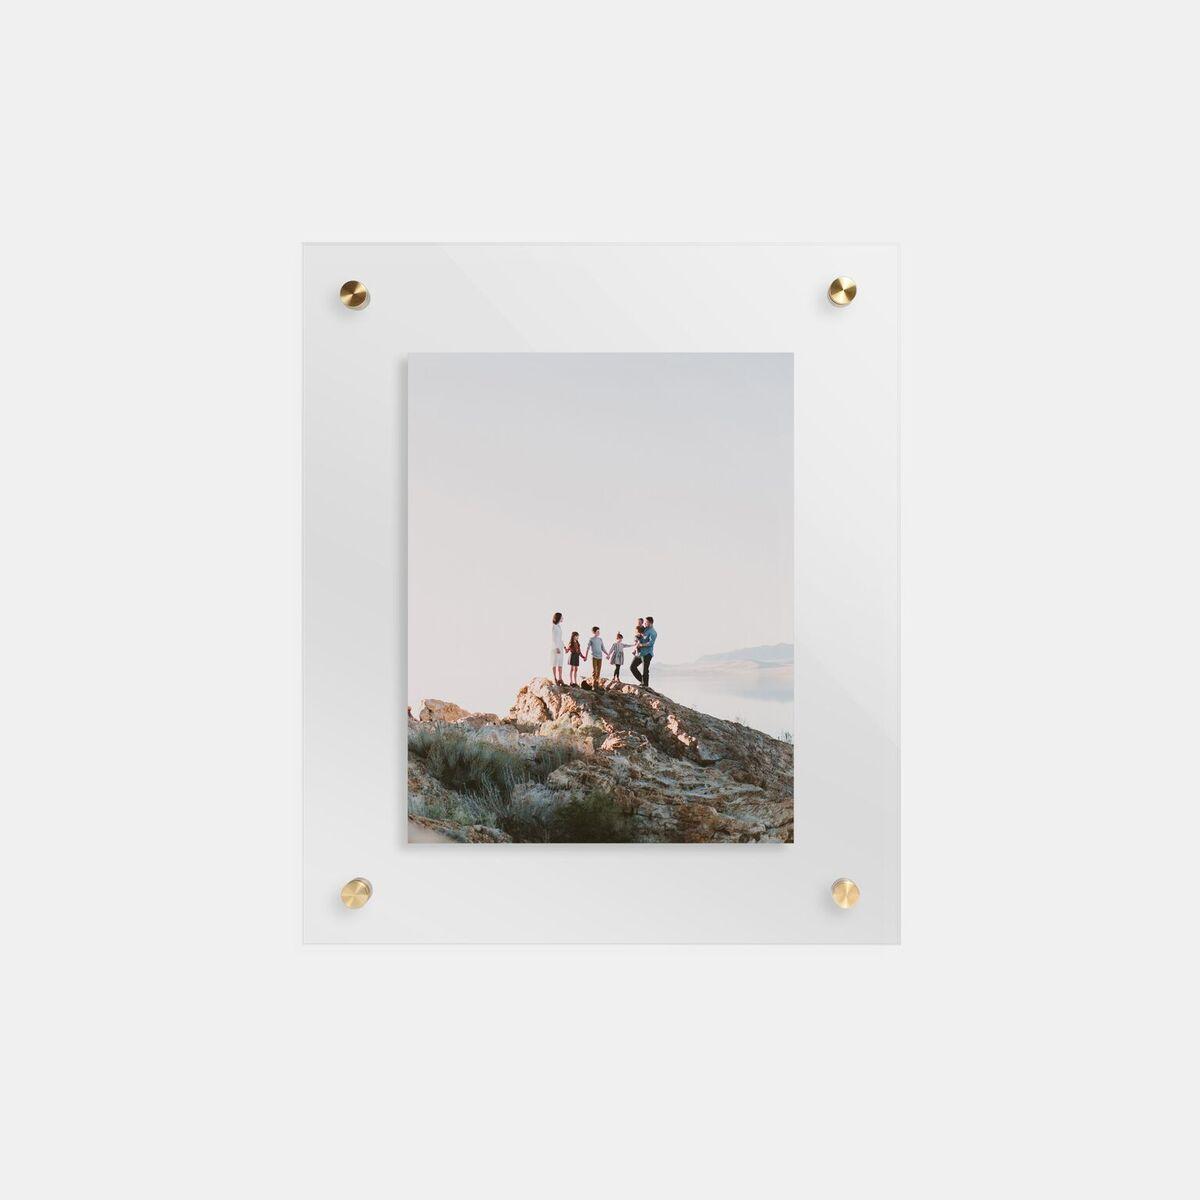 01-tendencia-molduras-transparentes-decor-8-artifact-uprising